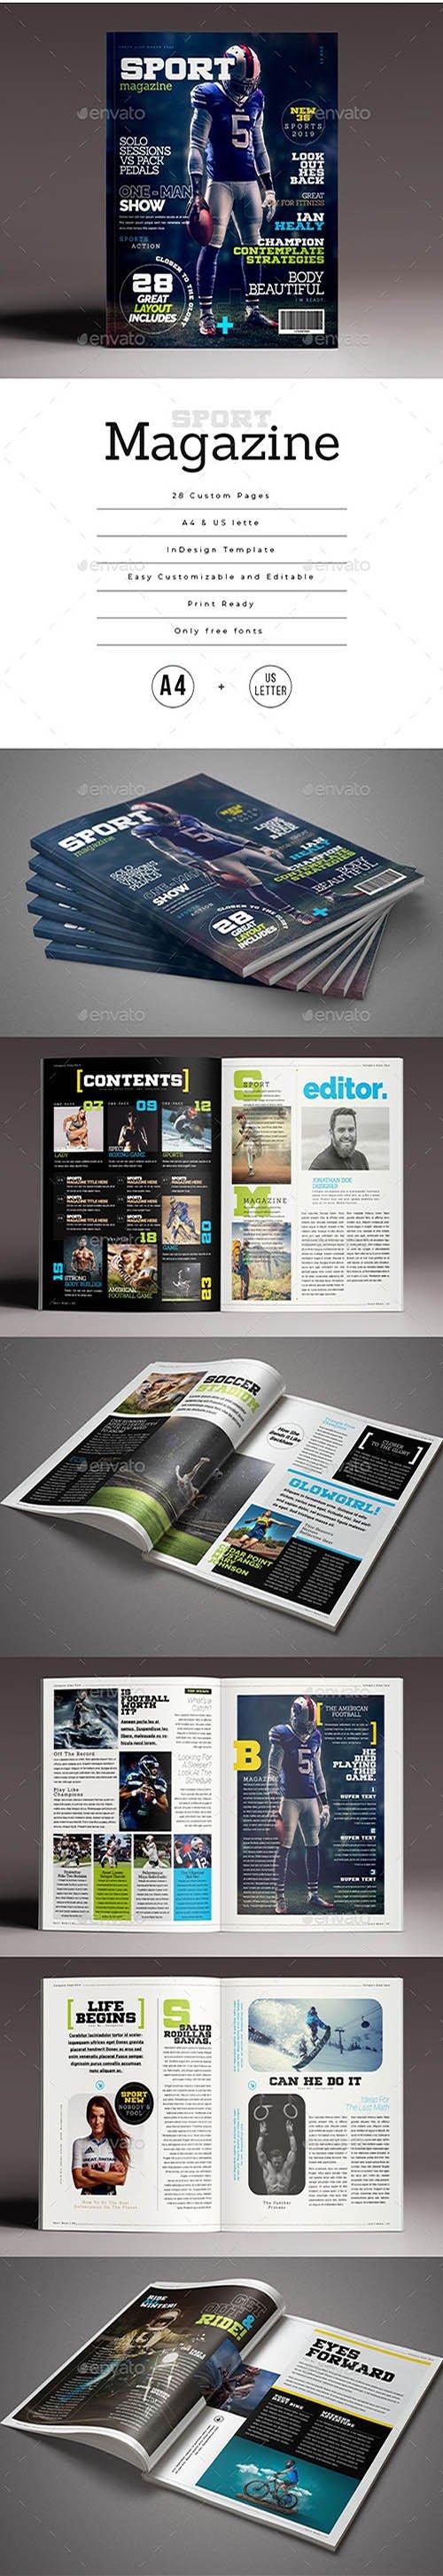 Sport Magazine 24640764